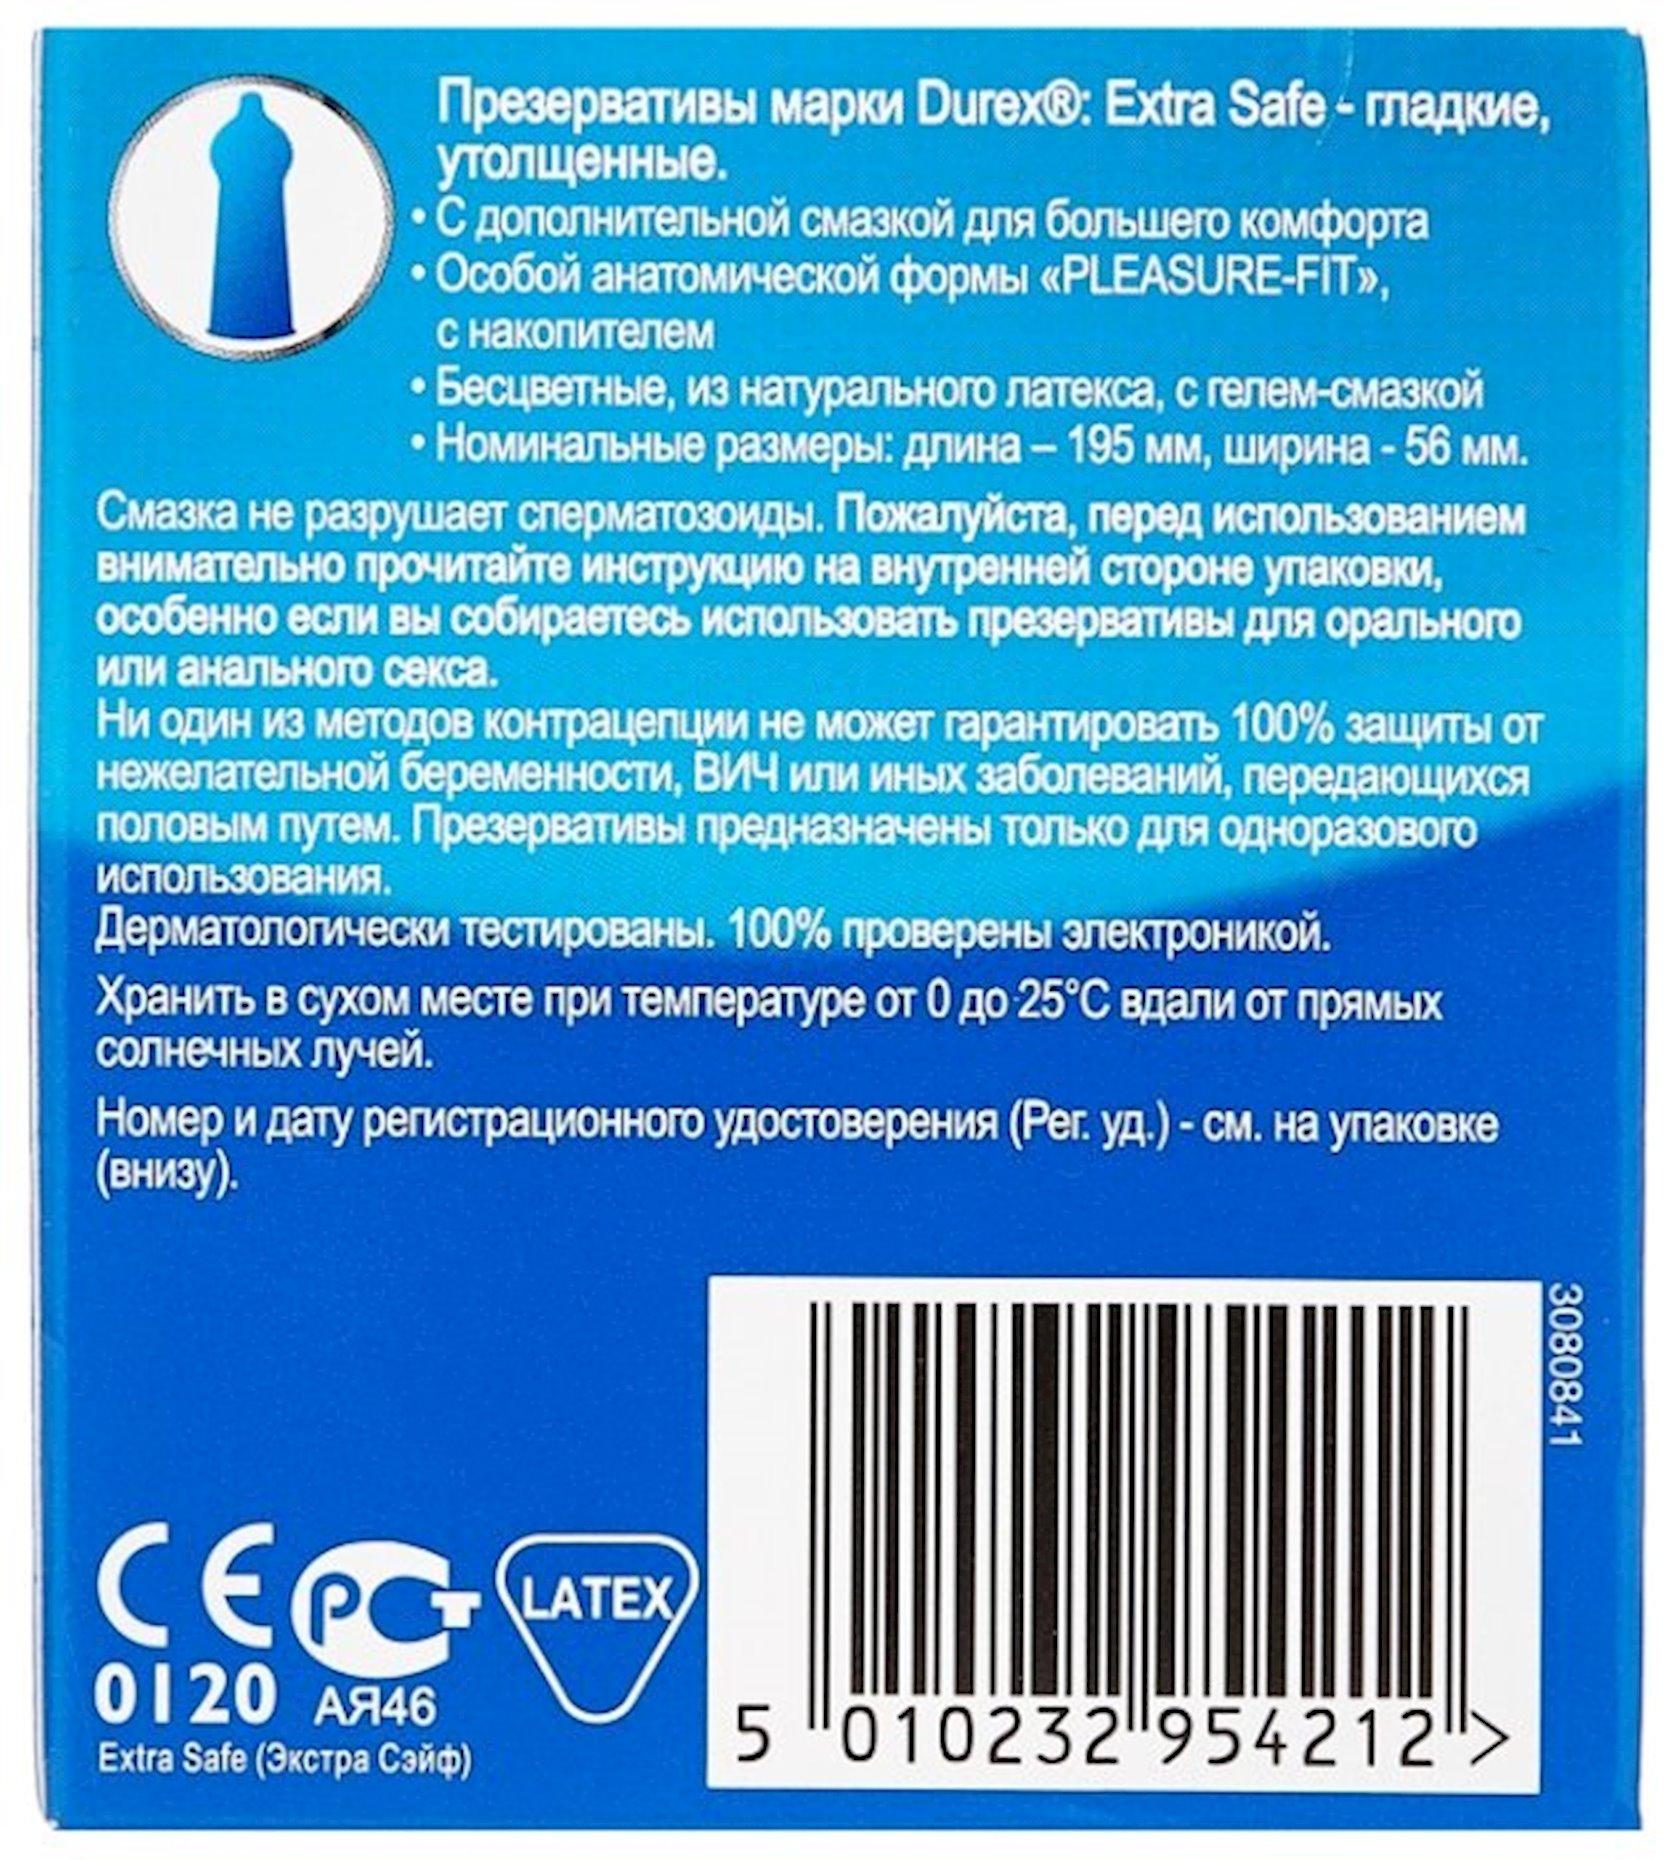 Prezervativlər Durex Extra Safe 3 ədəd